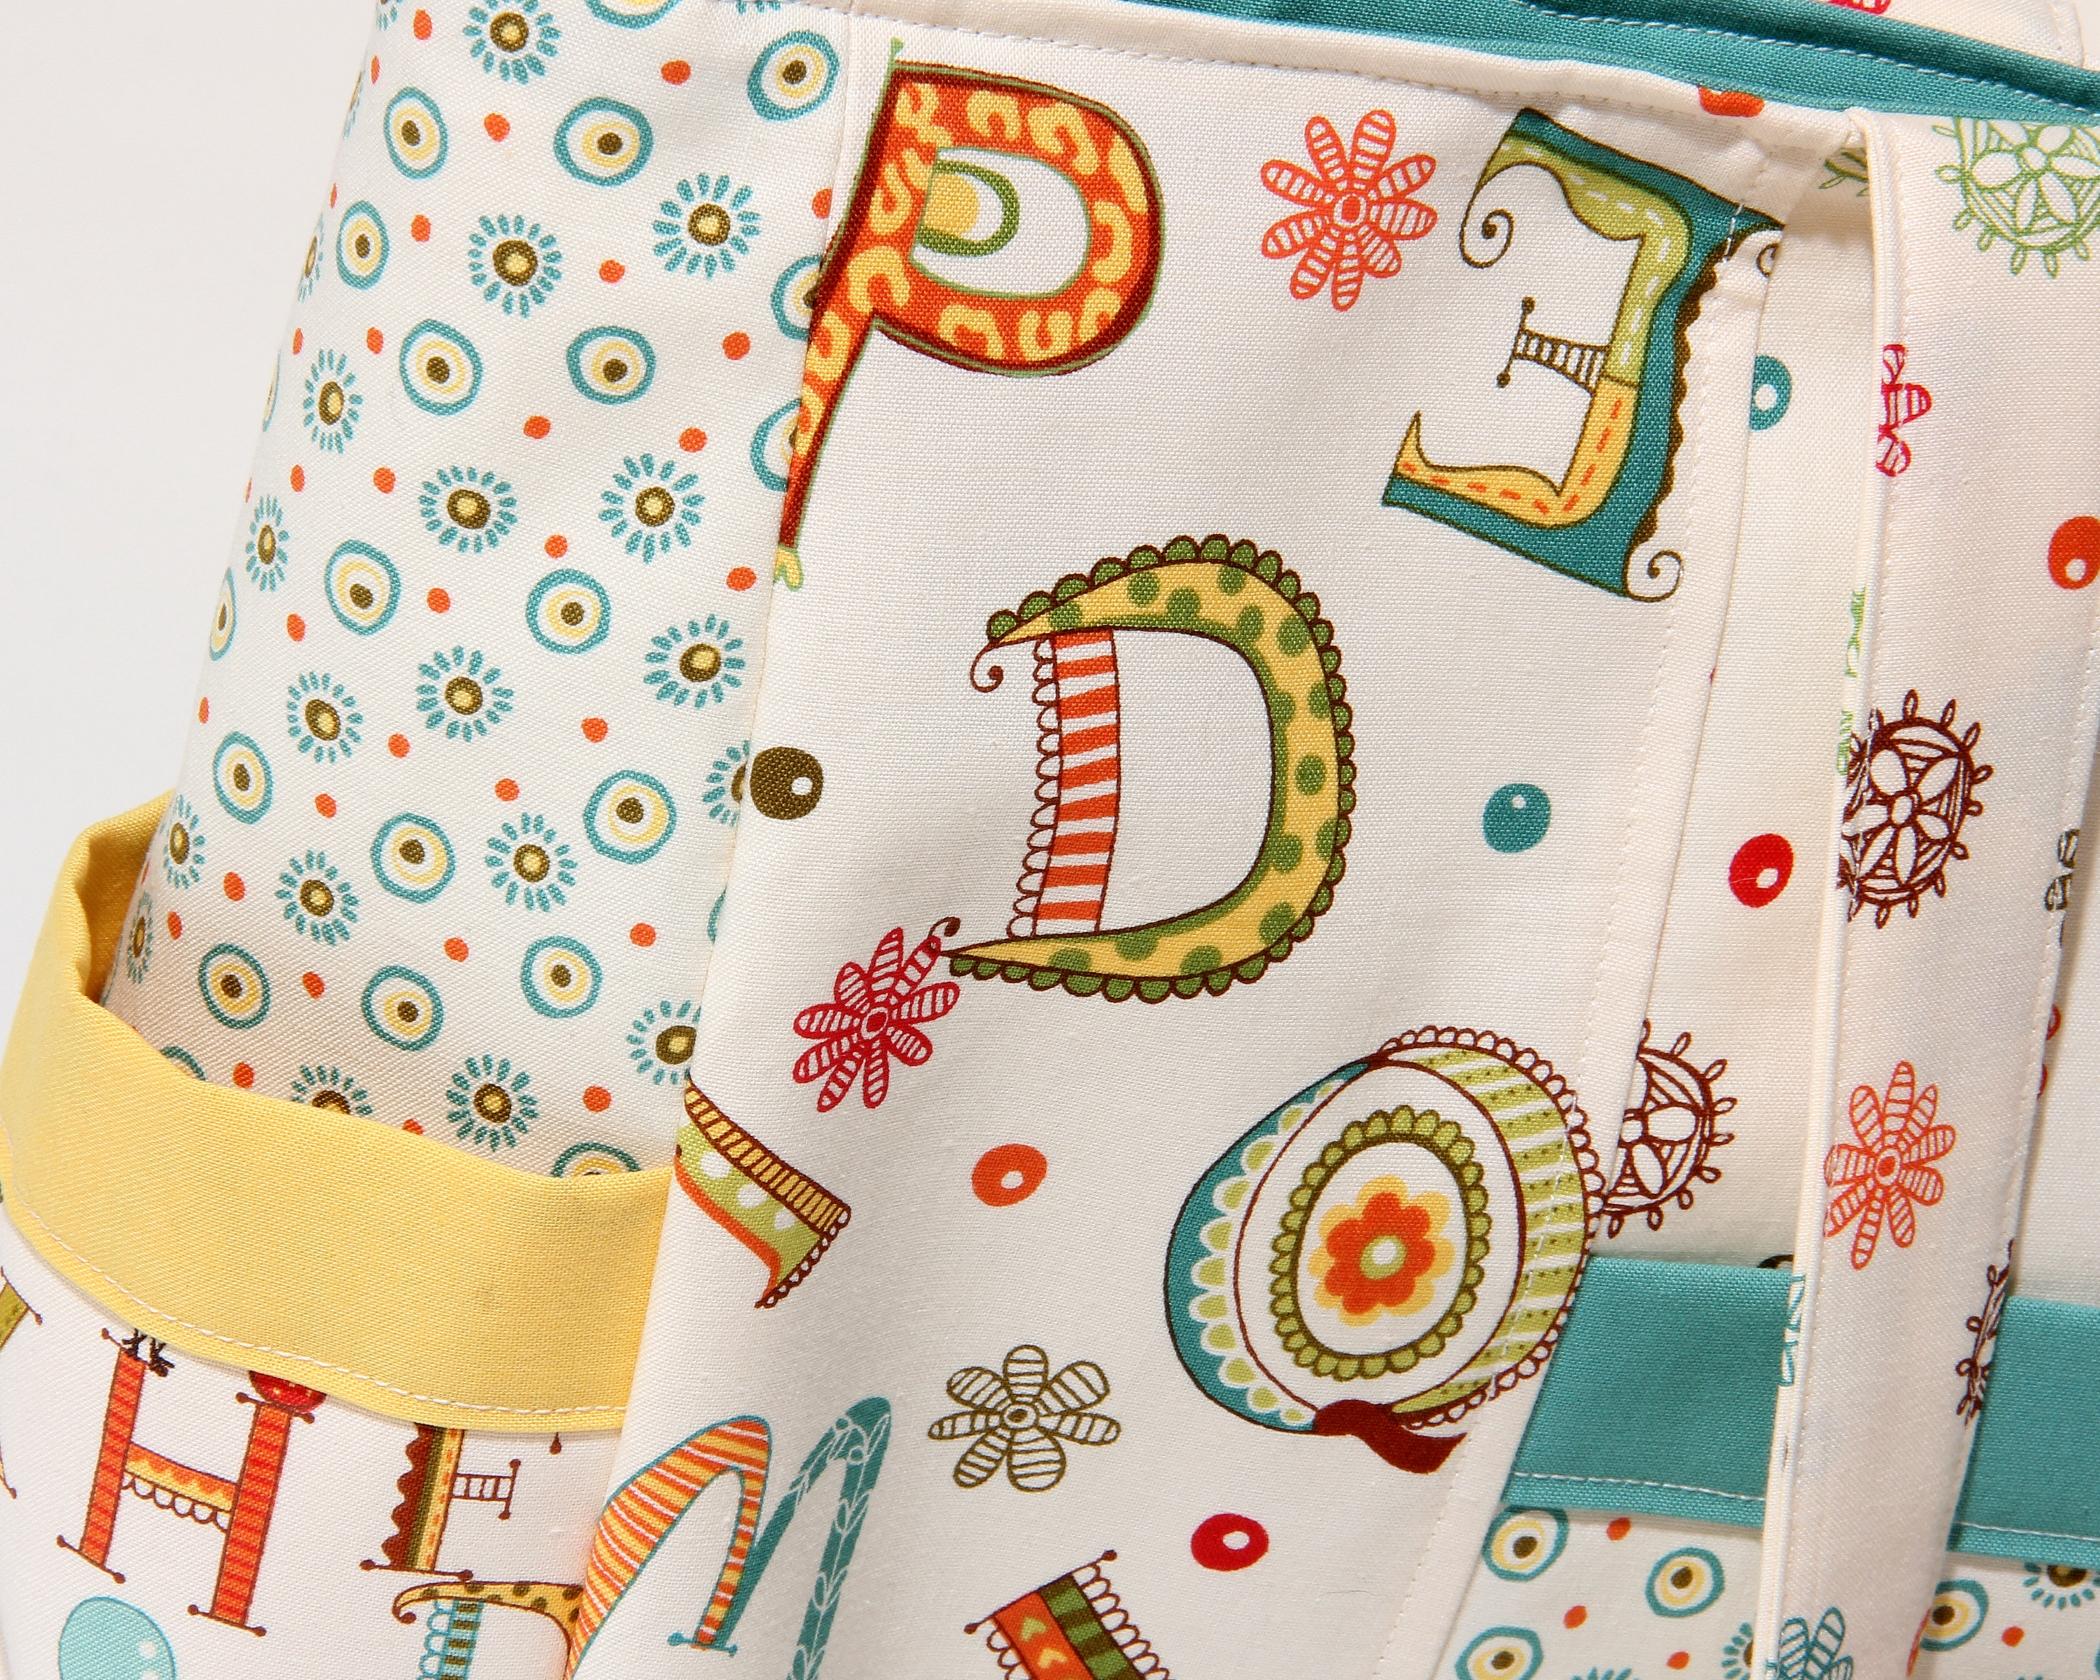 ABC Diaper Bag Pattern by SusieDDesigns 2